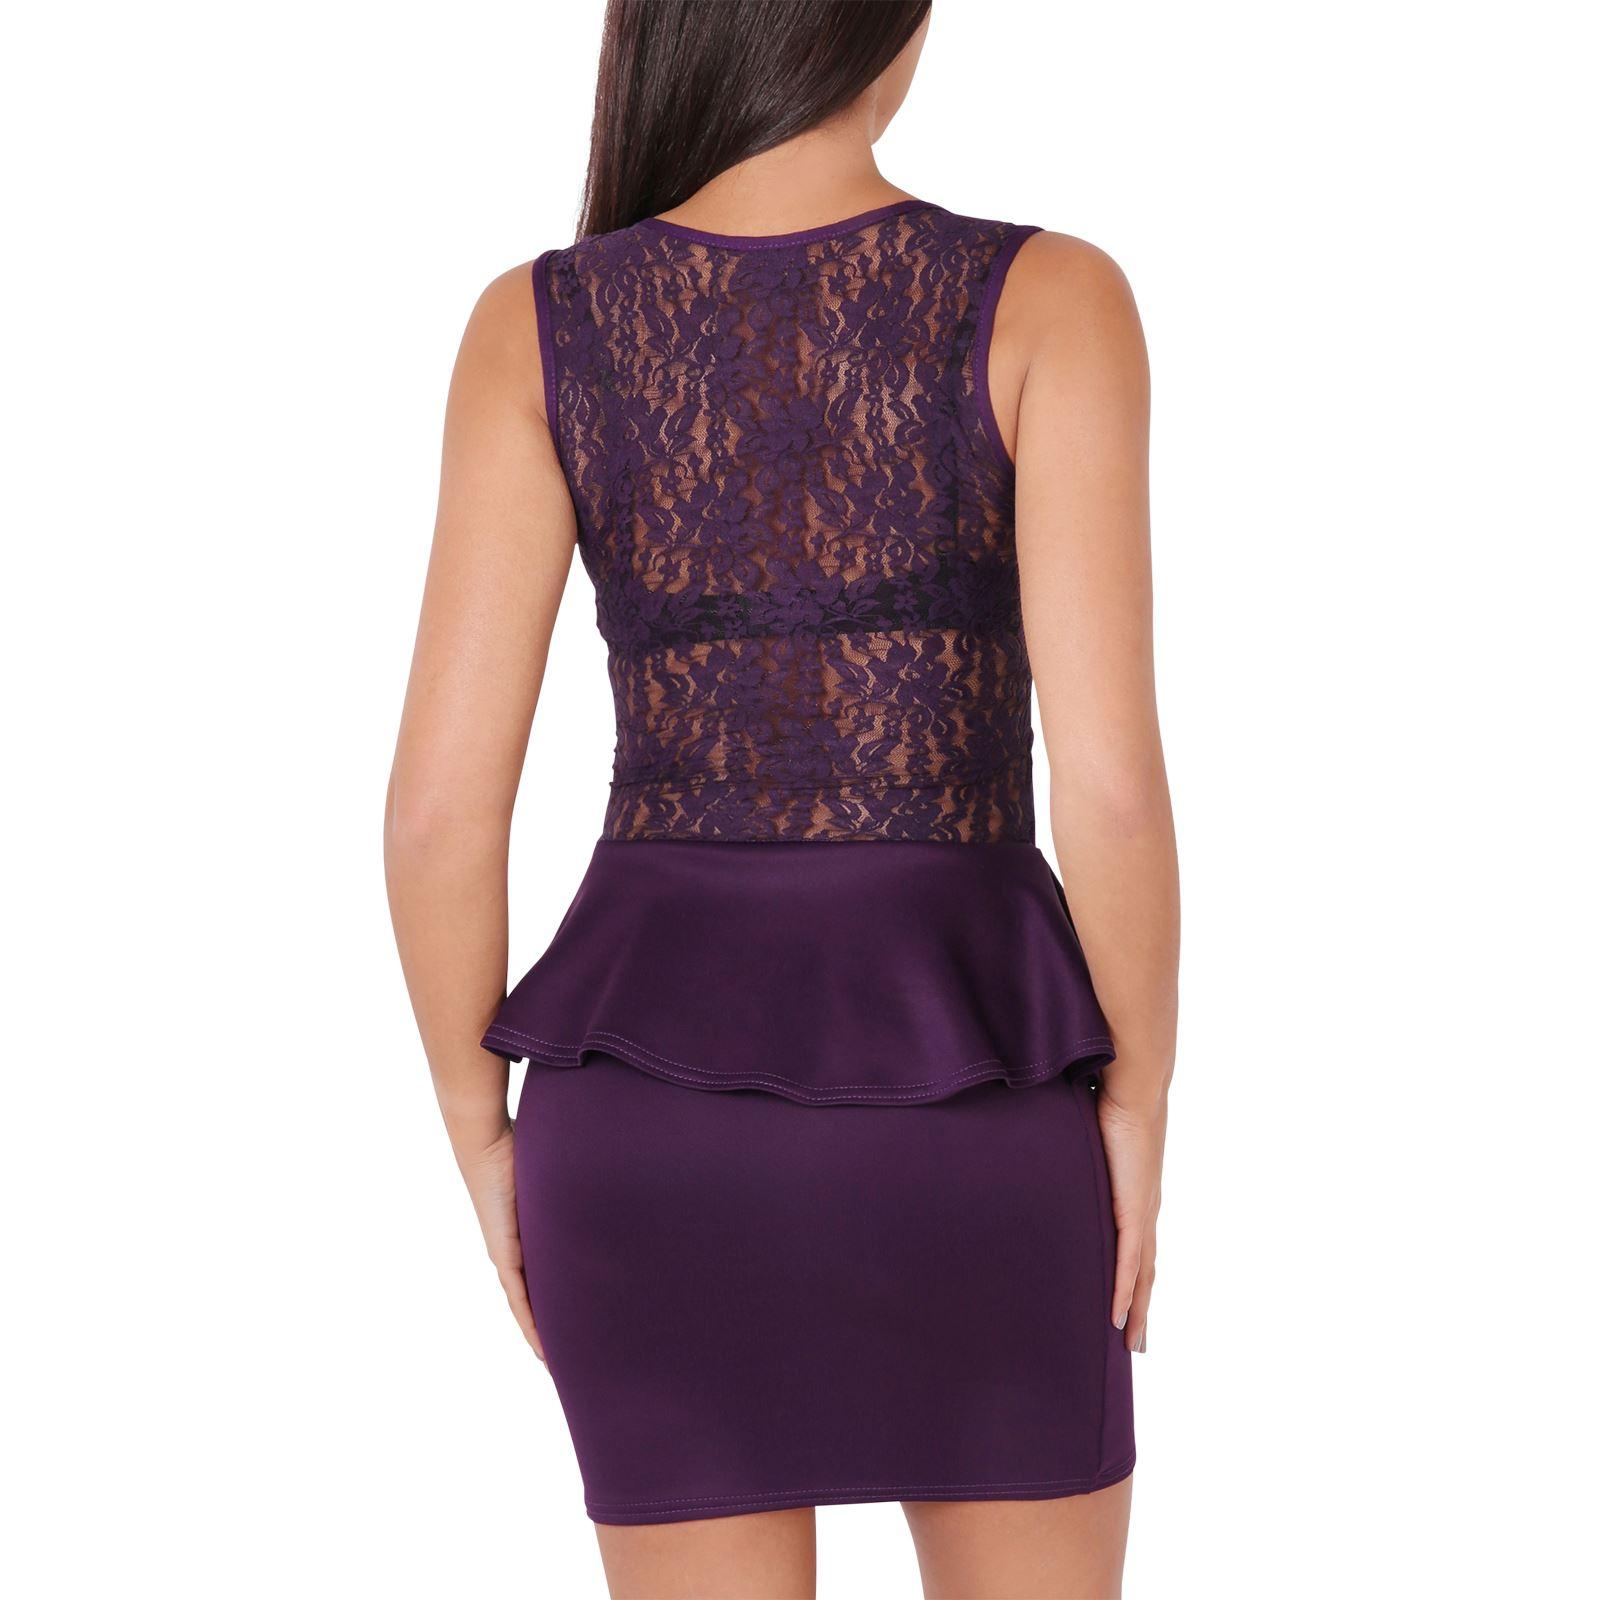 KRISP-Womens-Stretch-Bodycon-Peplum-Pencil-Dress-Lace-Frill-Mini-Ladies-Office